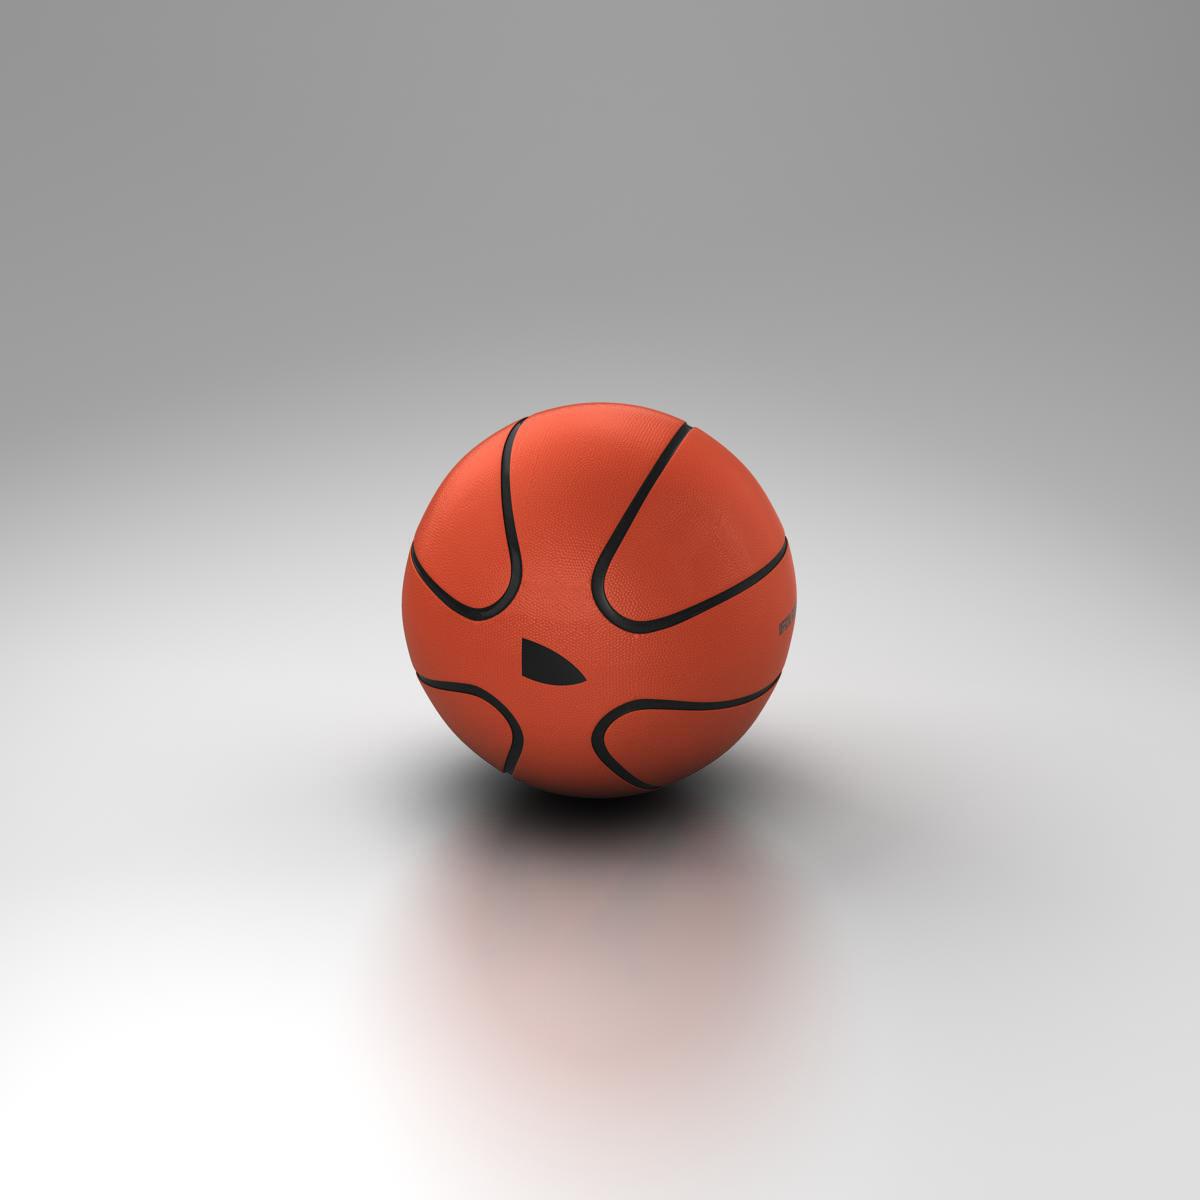 basketball ball star orange 3d model 3ds max fbx c4d ma mb obj 165722